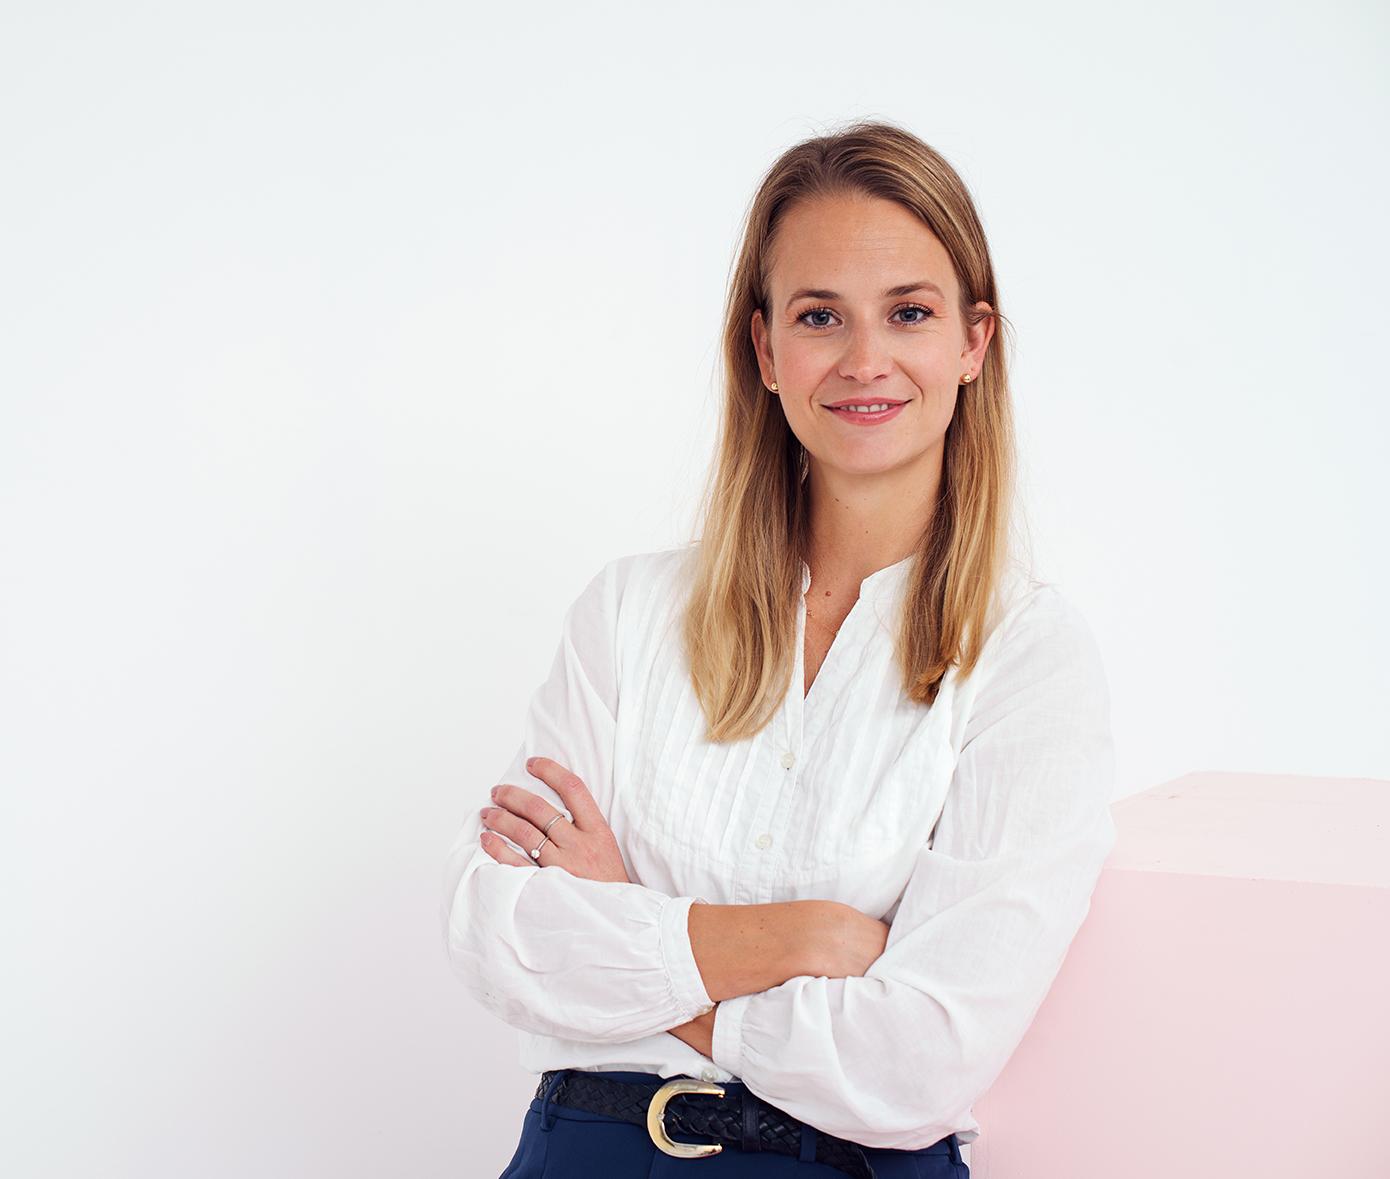 Maren Ørstavik